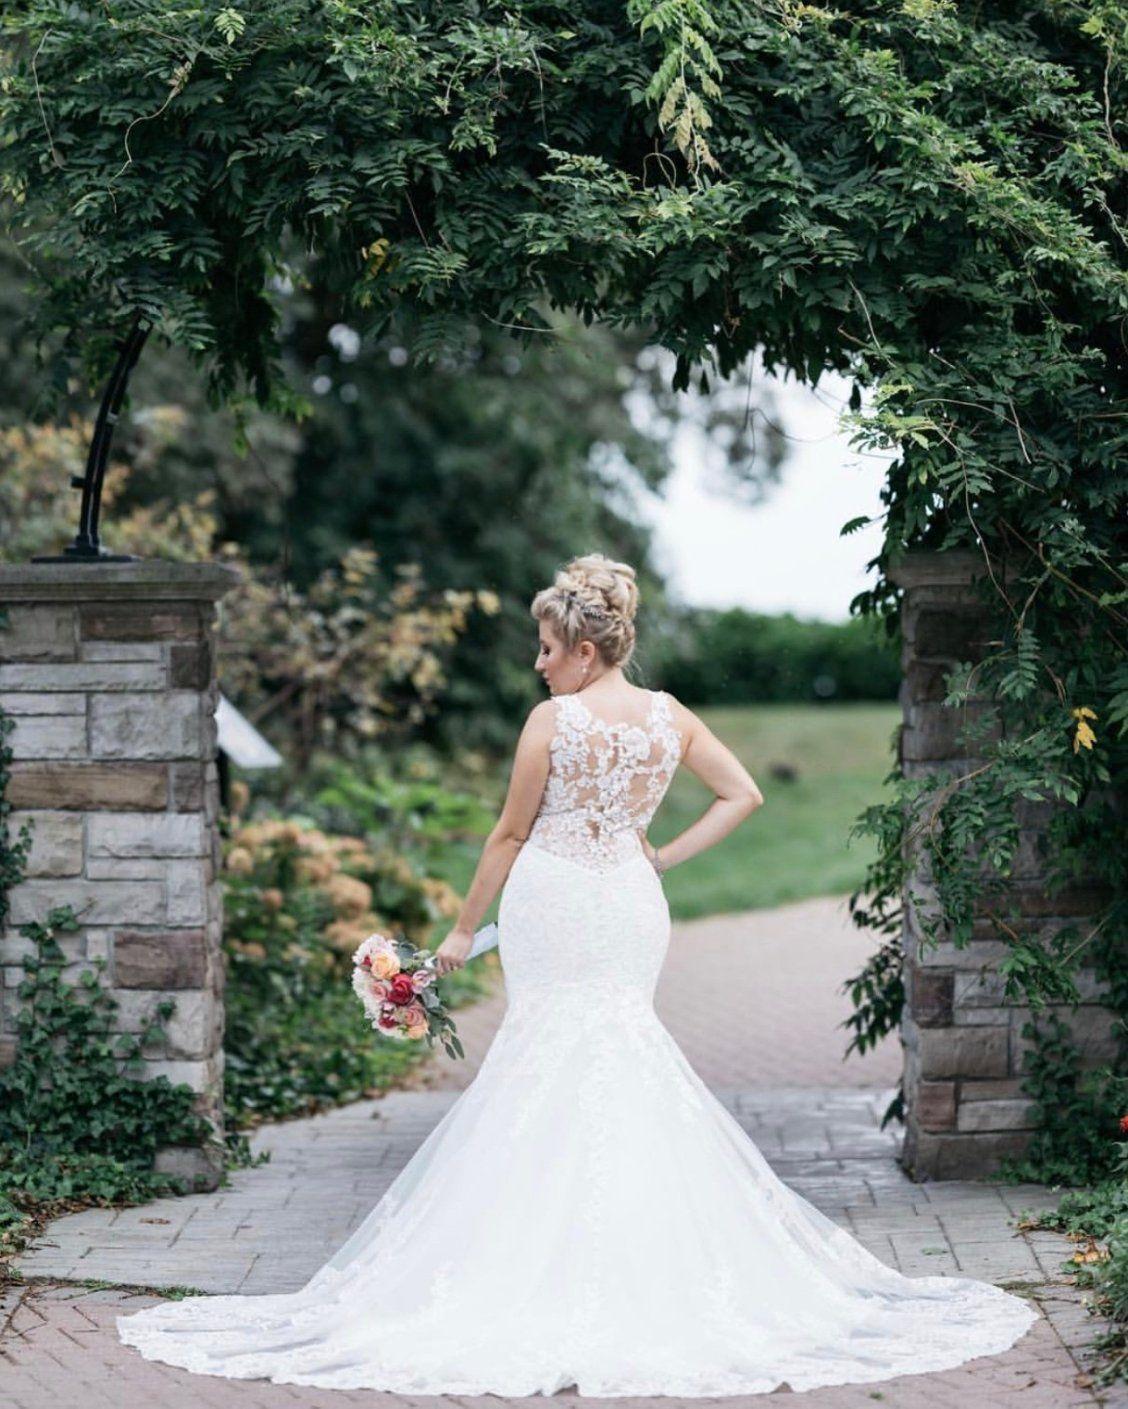 Allure Romance Style 3115 Colored Wedding Dress Bride Traditional Wedding Dresses [ 1409 x 1128 Pixel ]